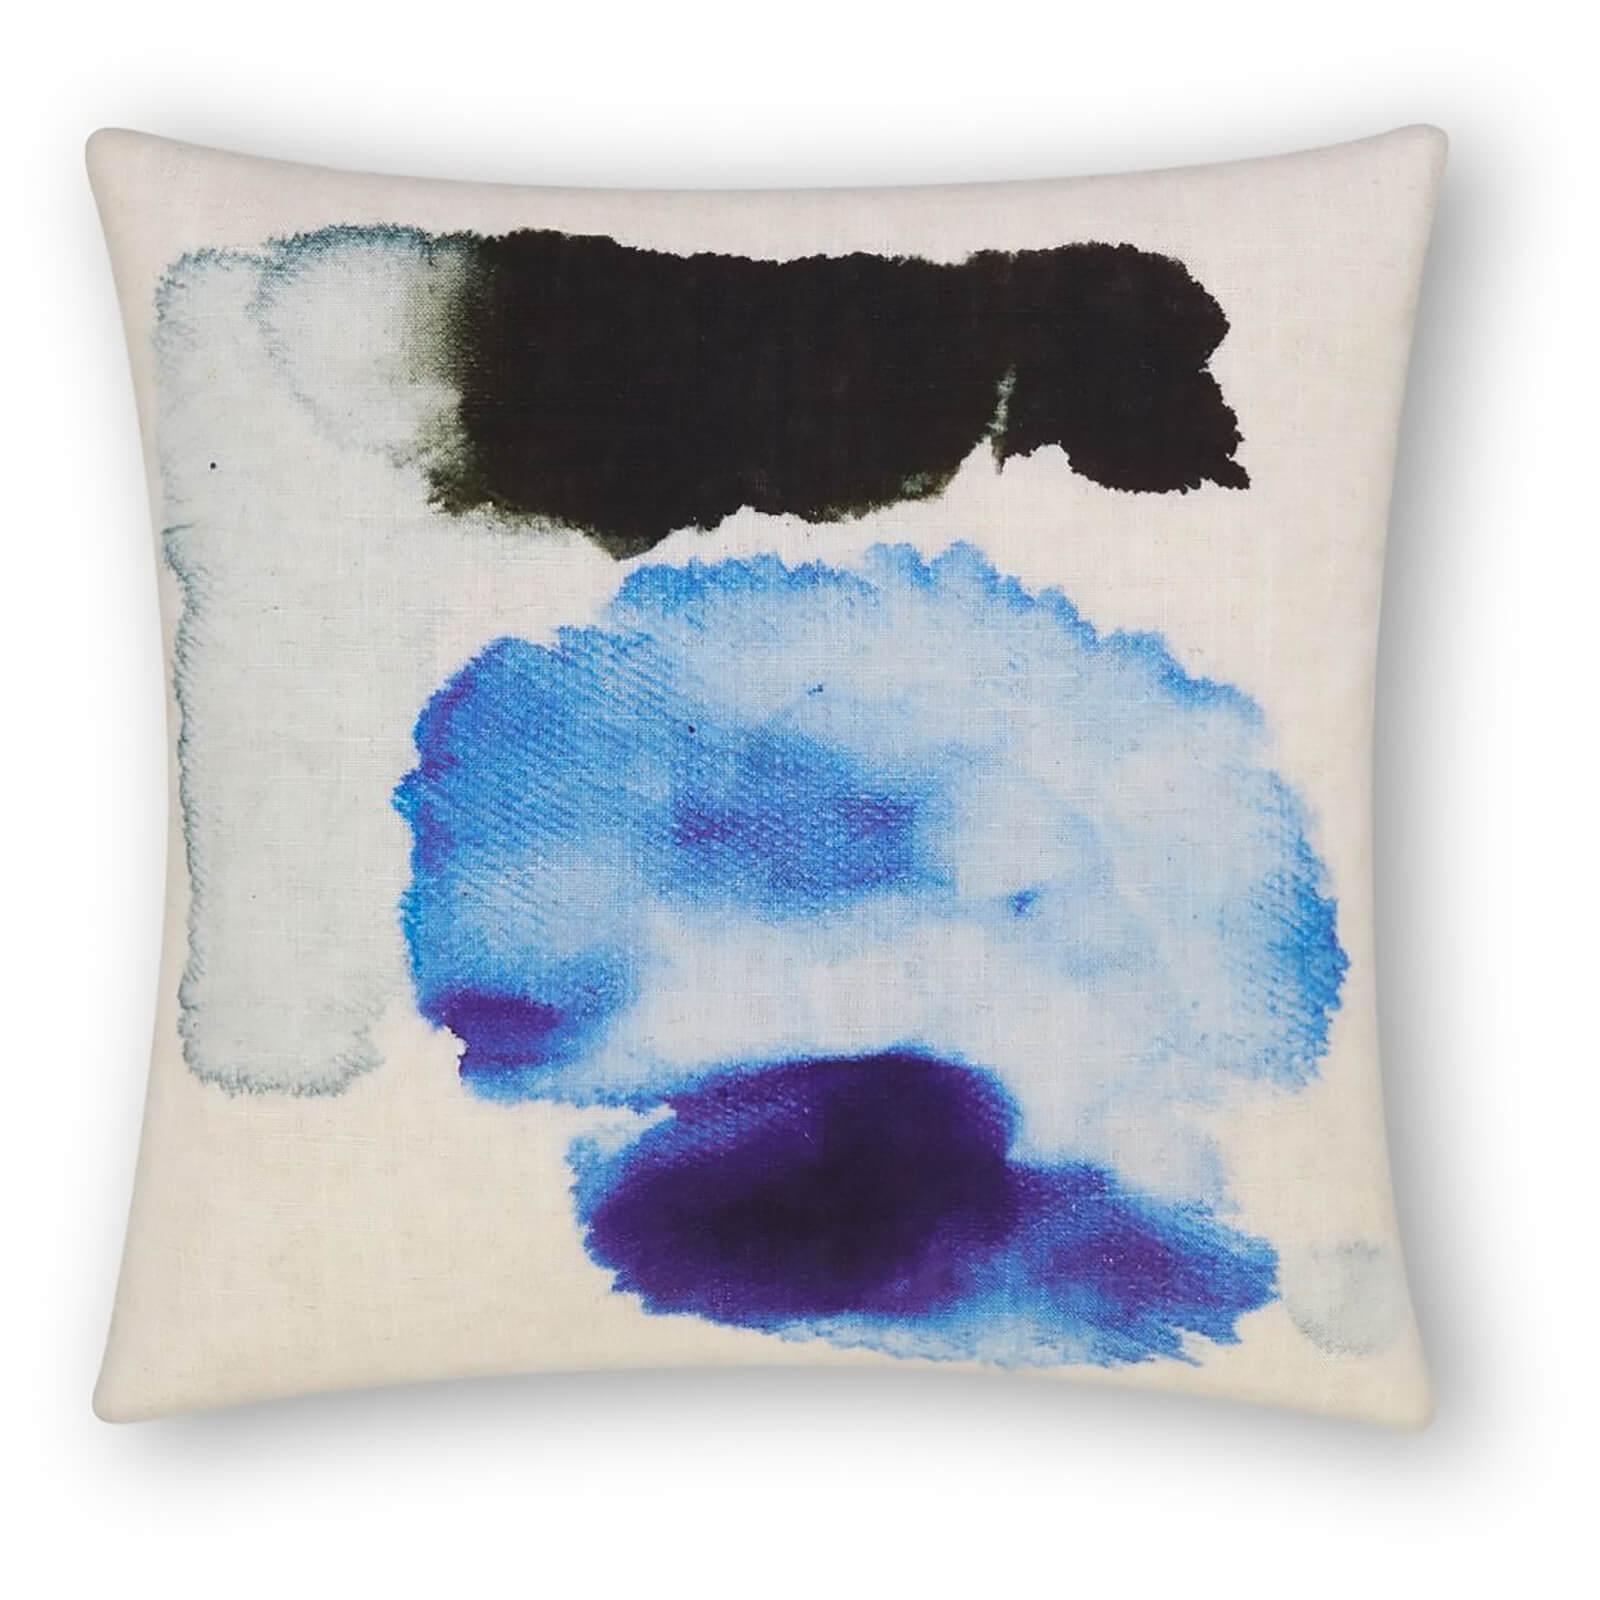 Tom Dixon Blot Cushion - 45 x 45cm